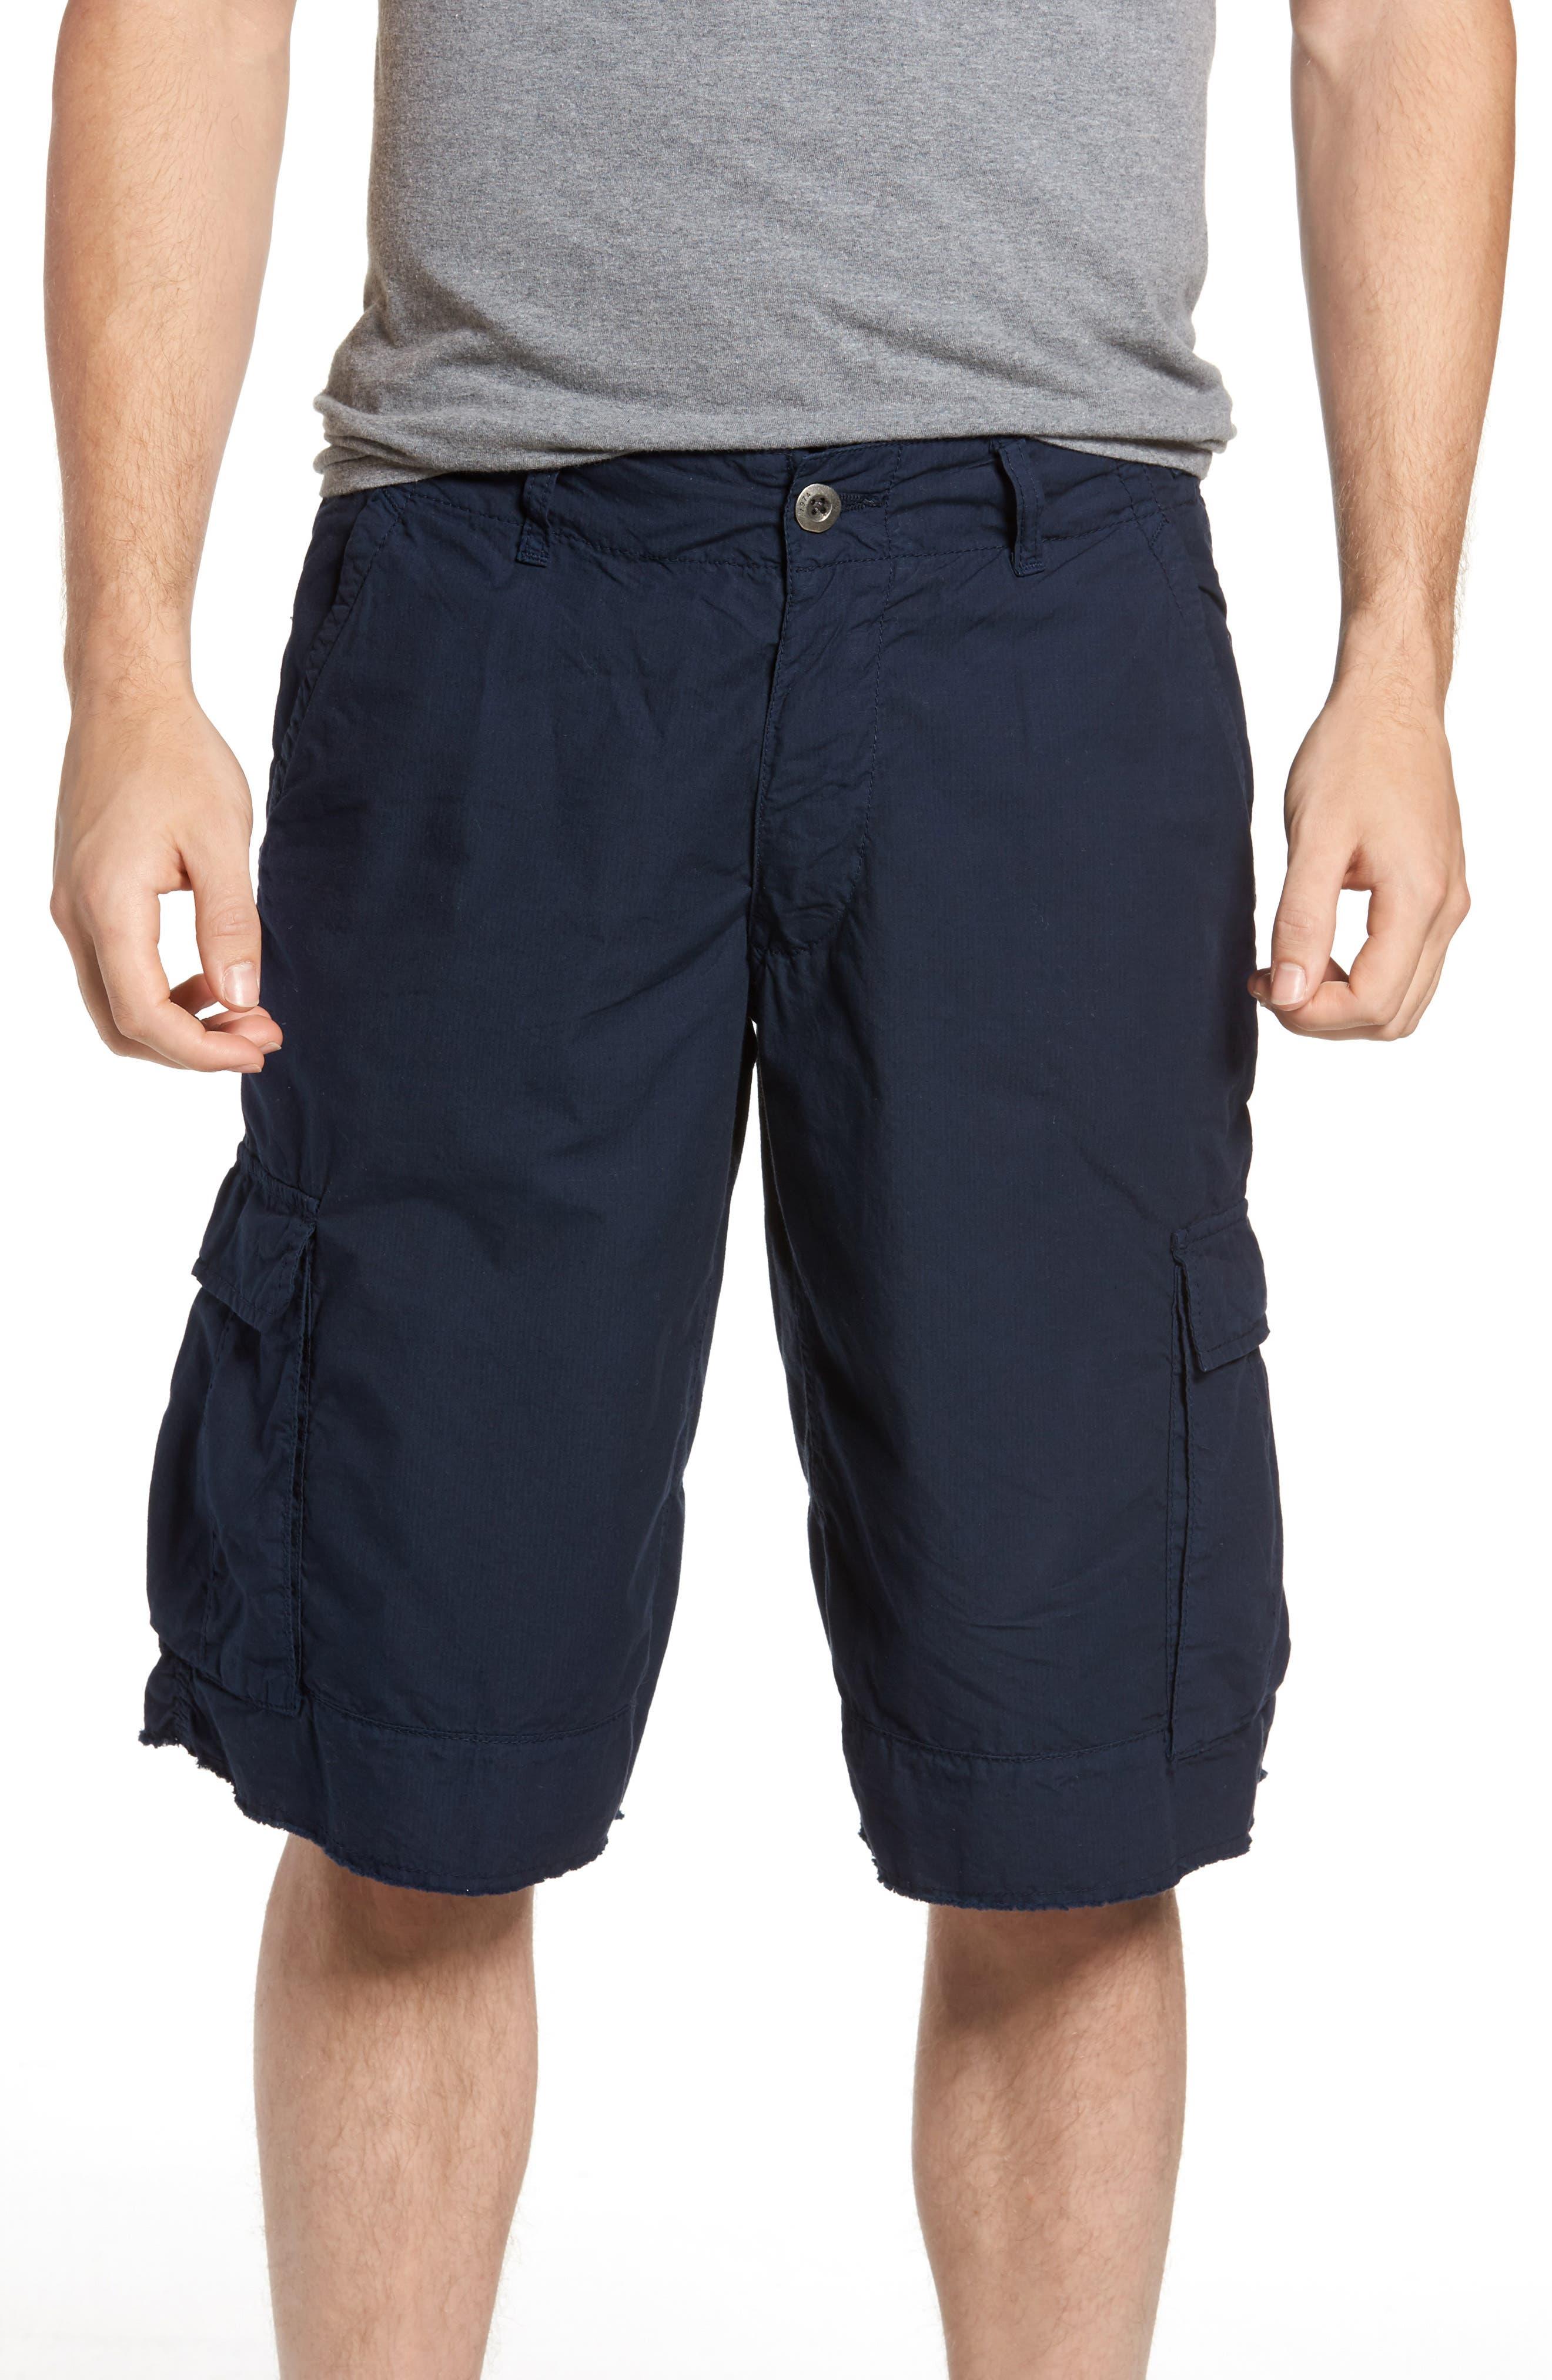 'Oxnard' Cargo Shorts,                             Main thumbnail 1, color,                             Navy